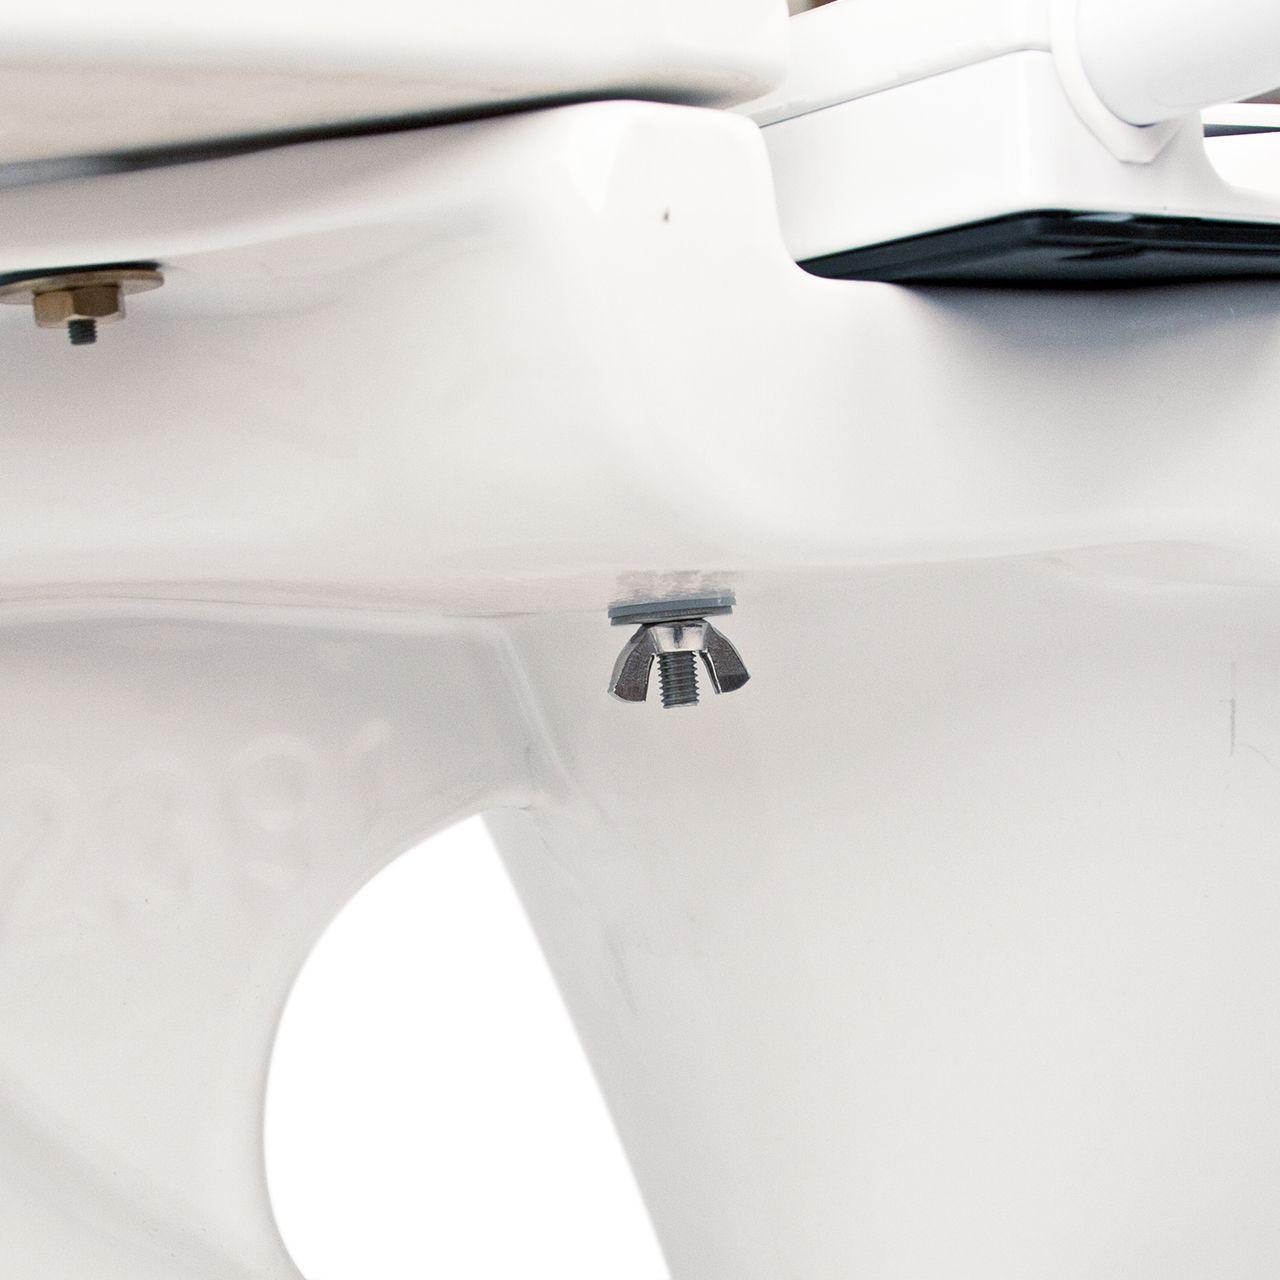 hi loo vaste toiletverhoger details